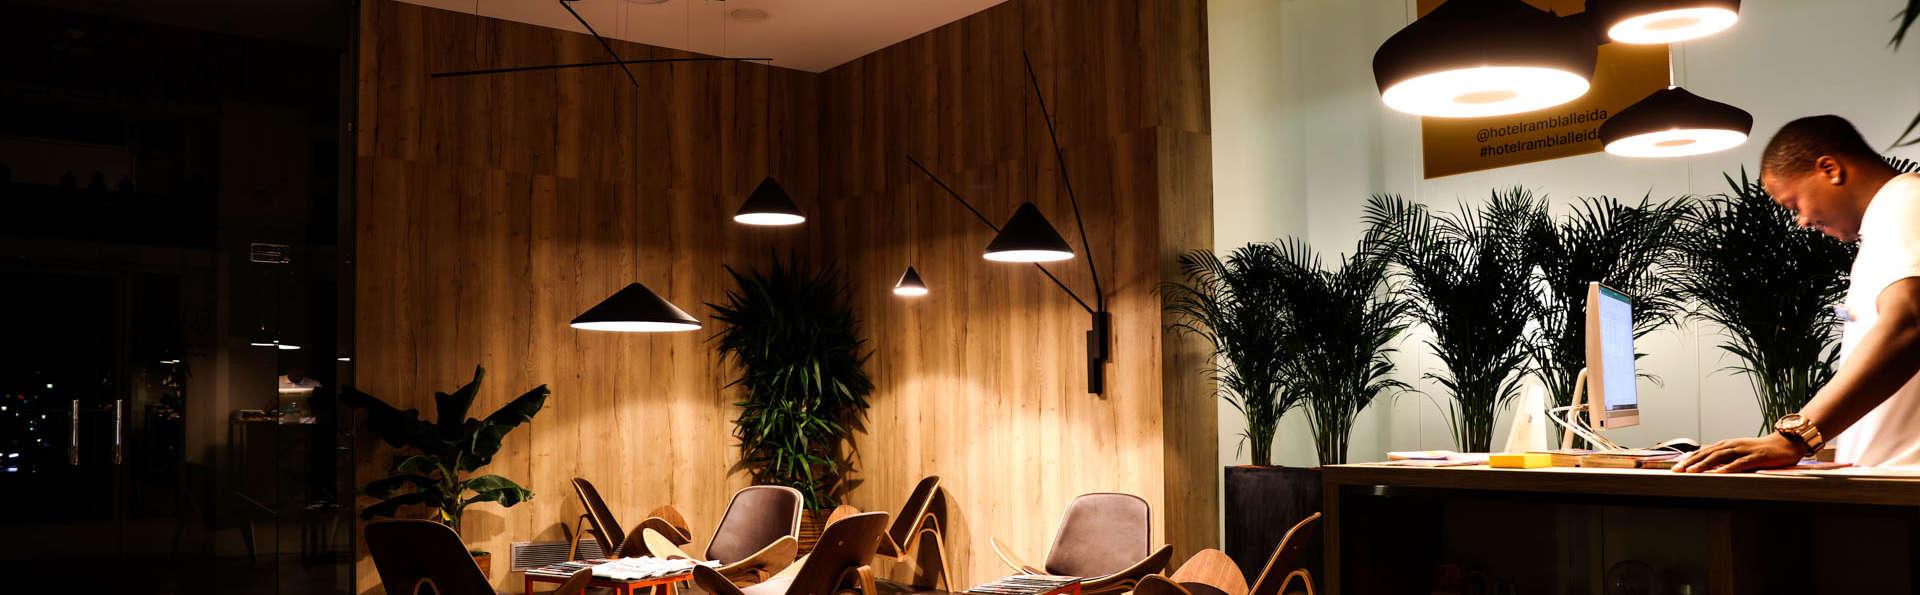 Hotel Rambla Lleida - EDIT_Reception2.jpg